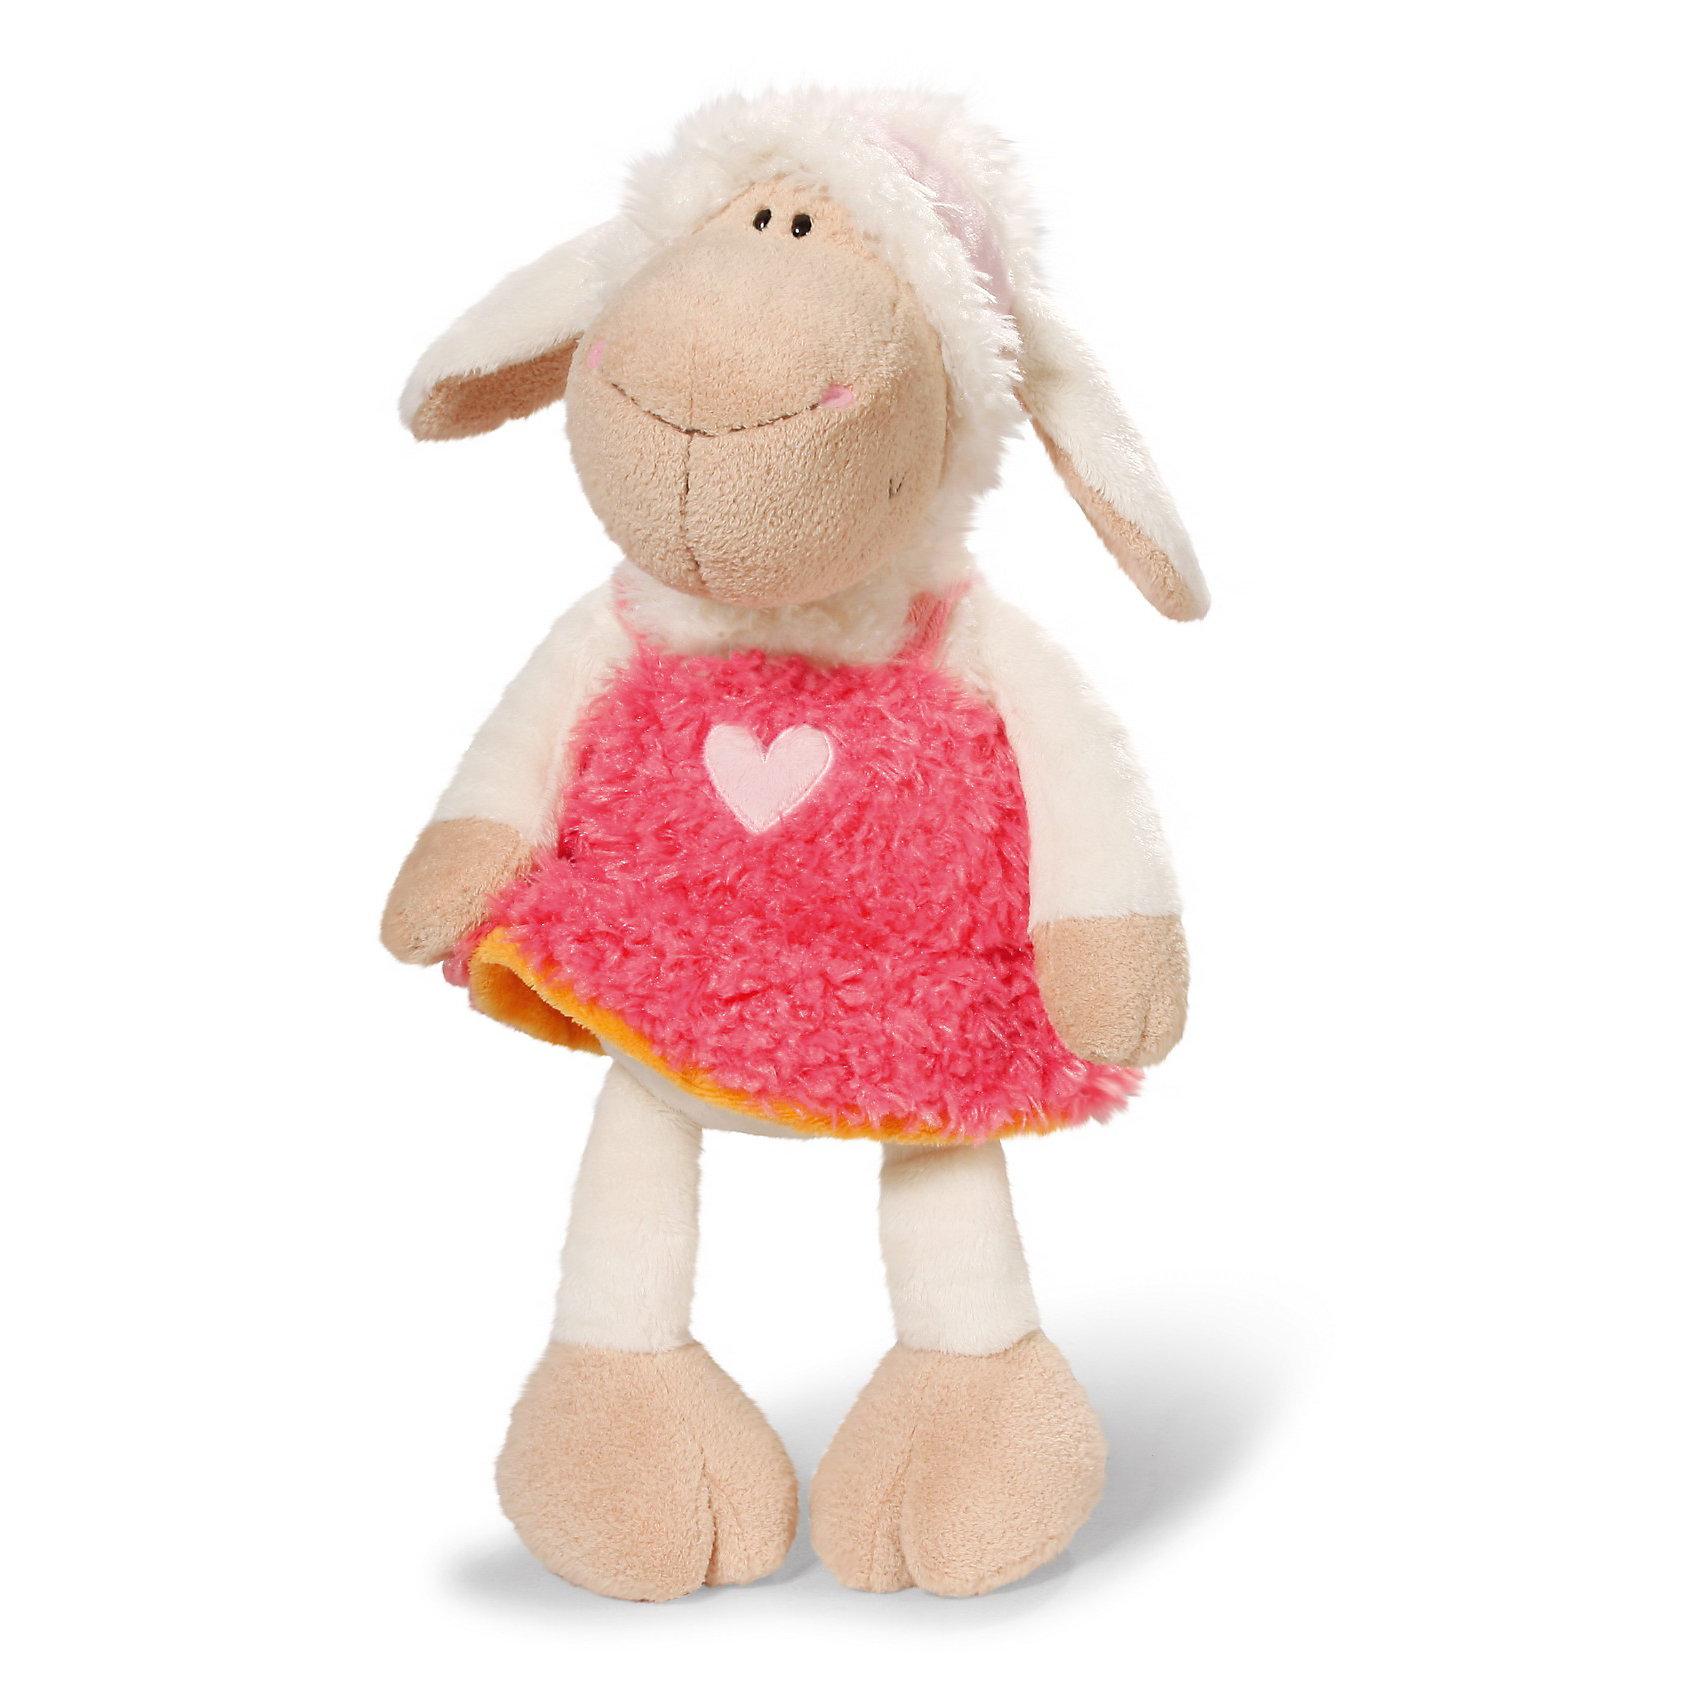 NICI Овечка Фрэнсис, 25см,  NICI nici мягкая игрушка овечка френсис сидячая